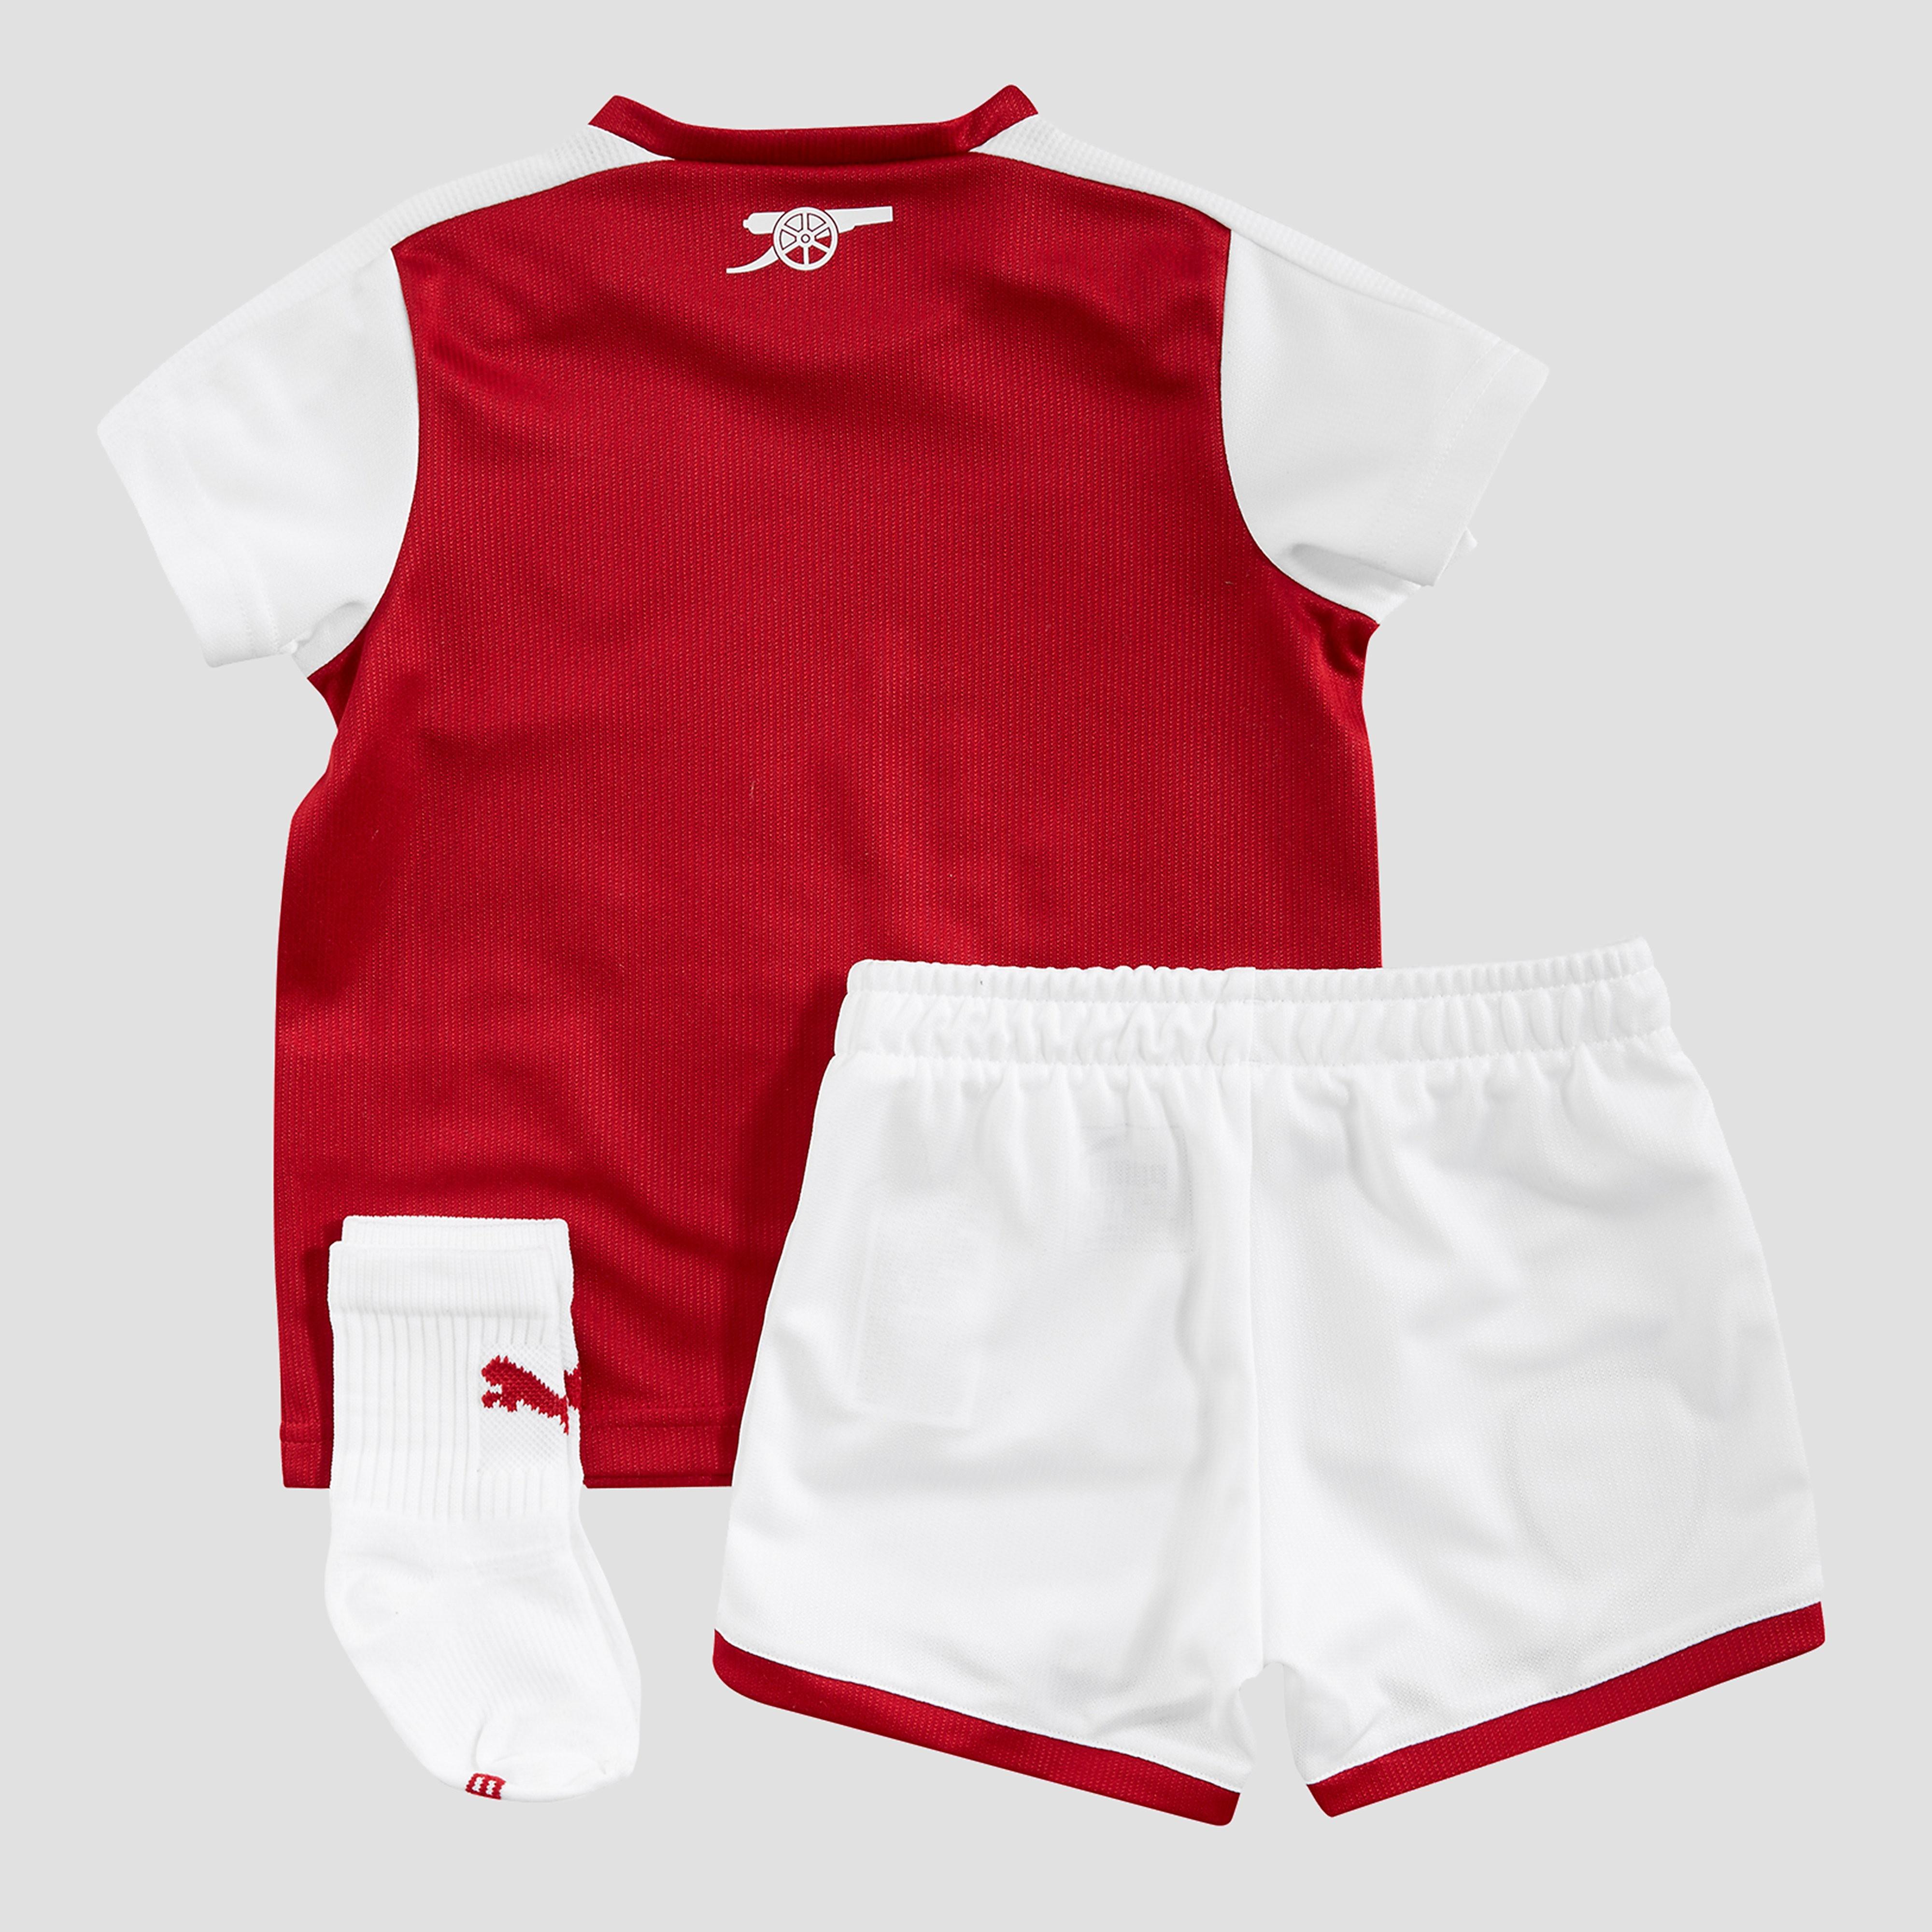 PUMA Arsenal FC 2017/18 Home Kit Infant